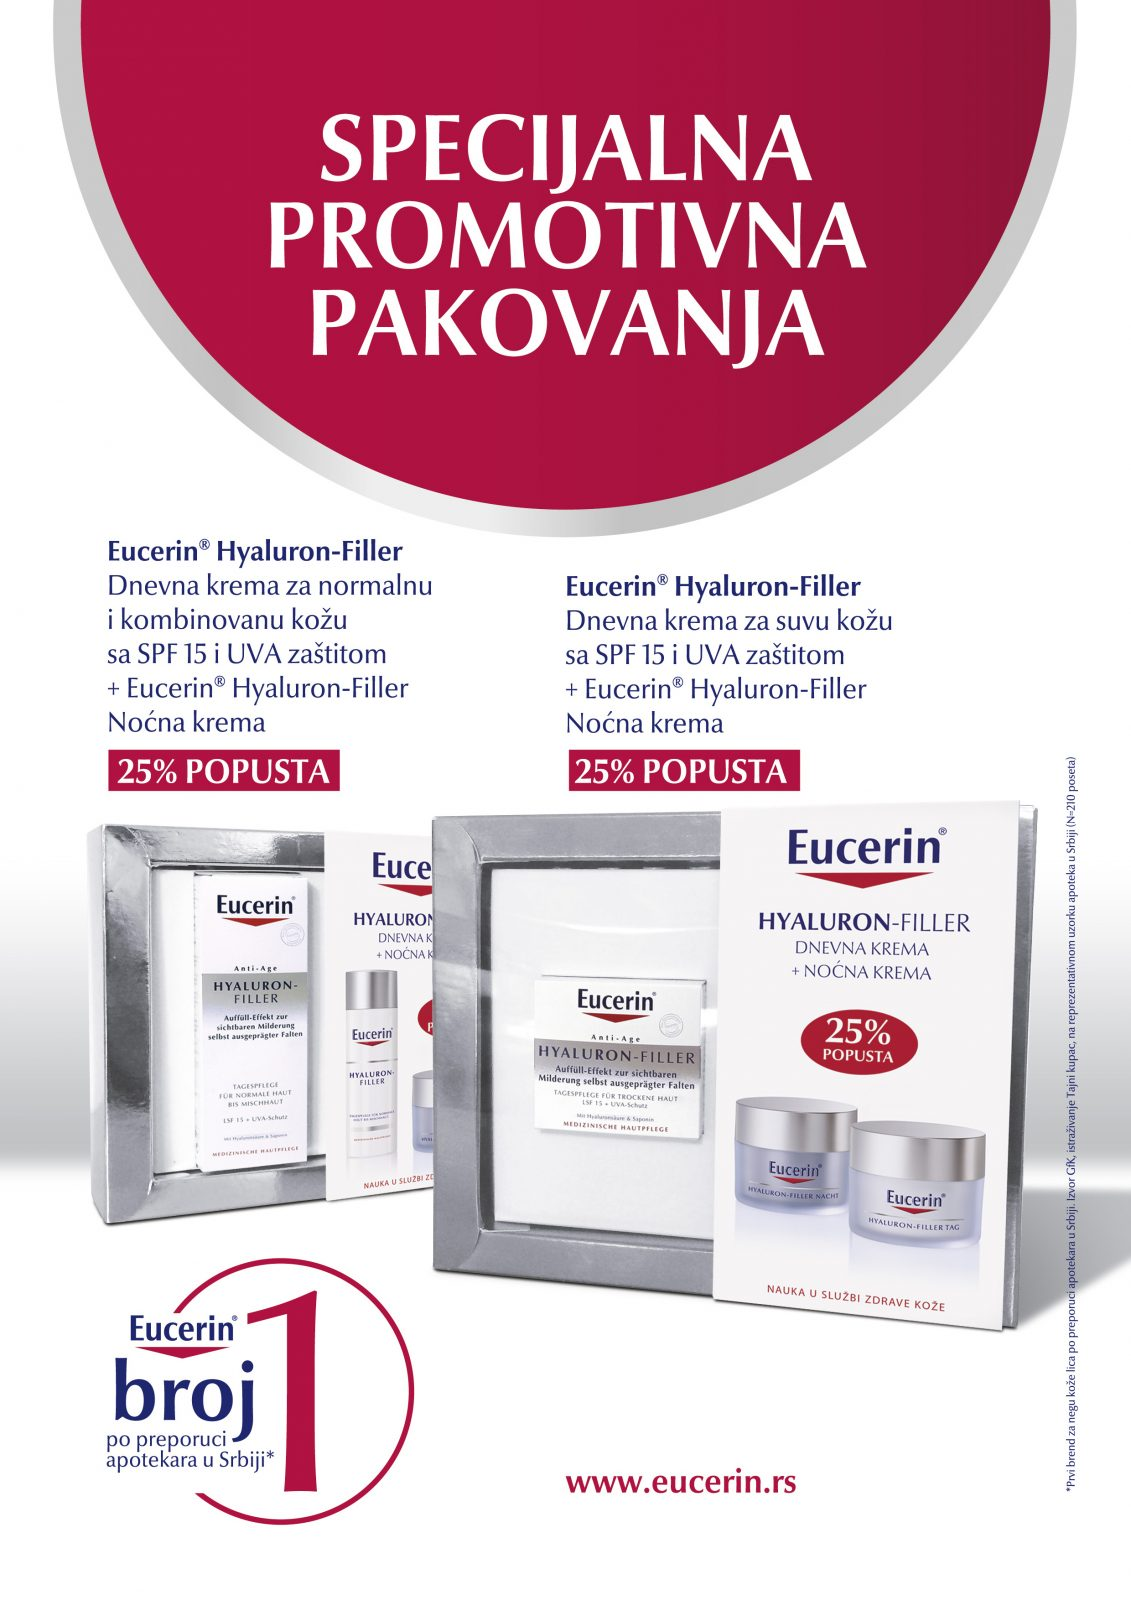 Eucerin Najava CoPacka A4 pp